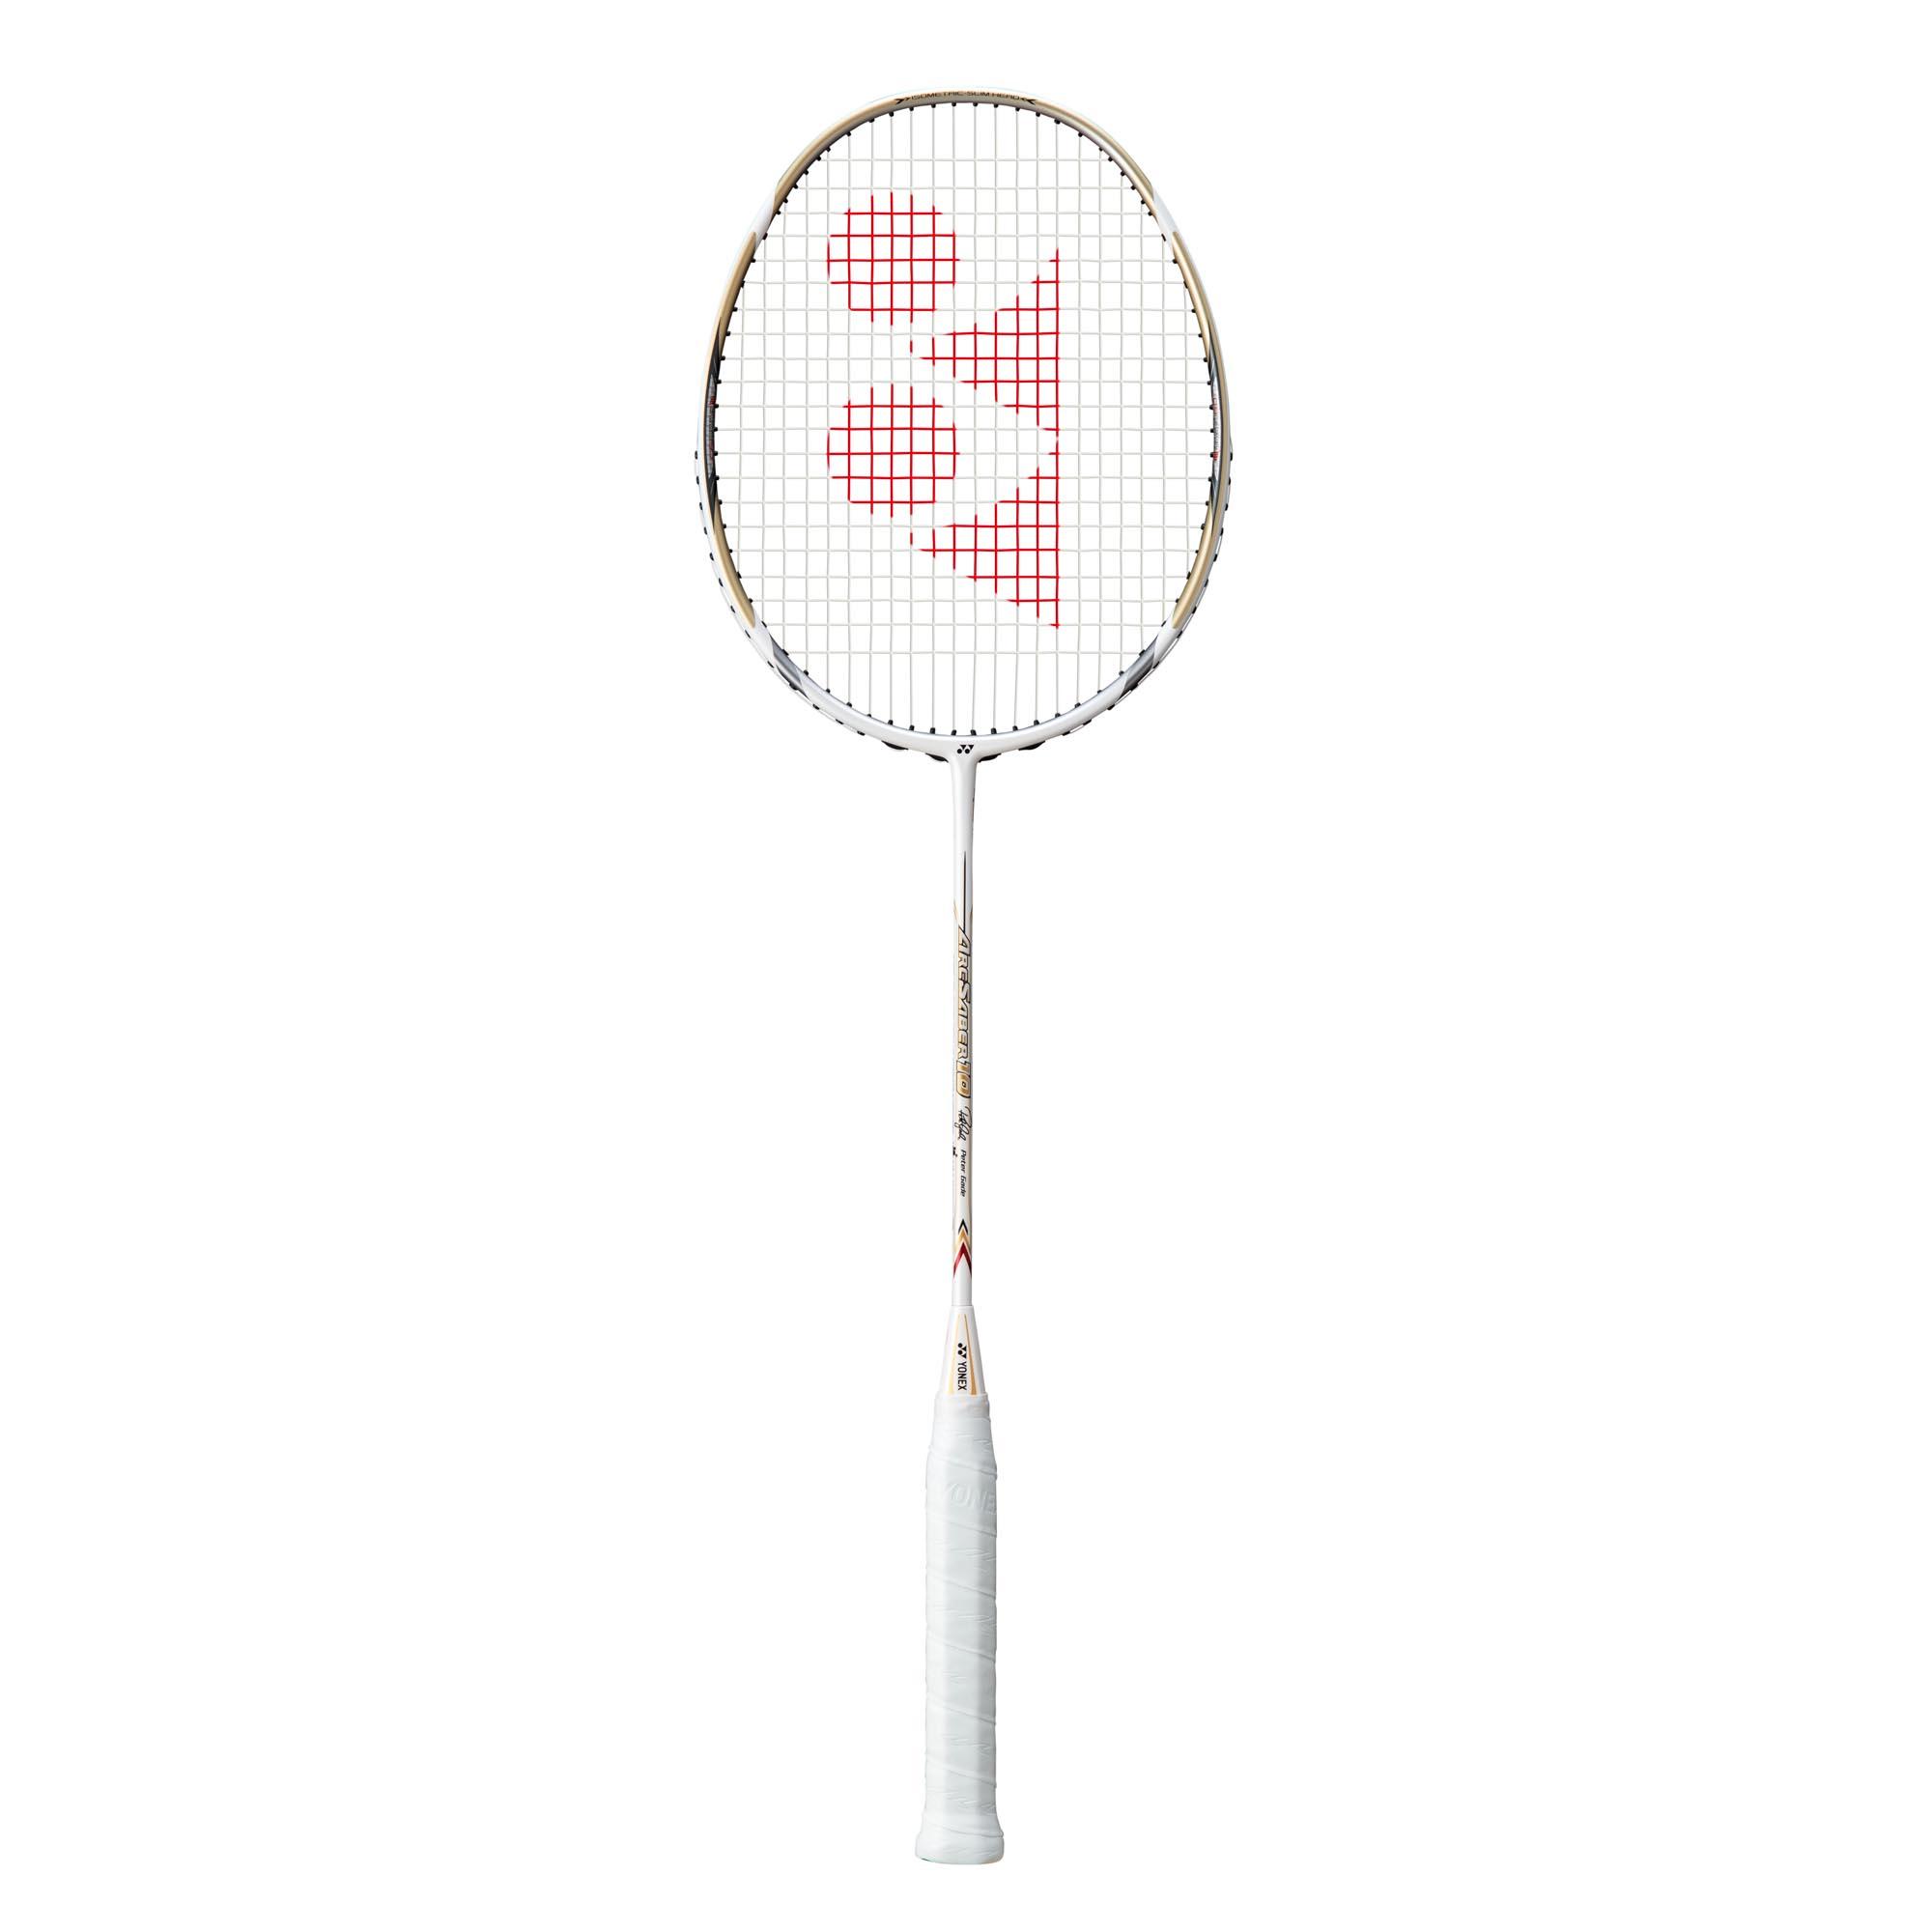 Yonex ArcSaber 10 Legends Vision Peter Gade Badminton Racket